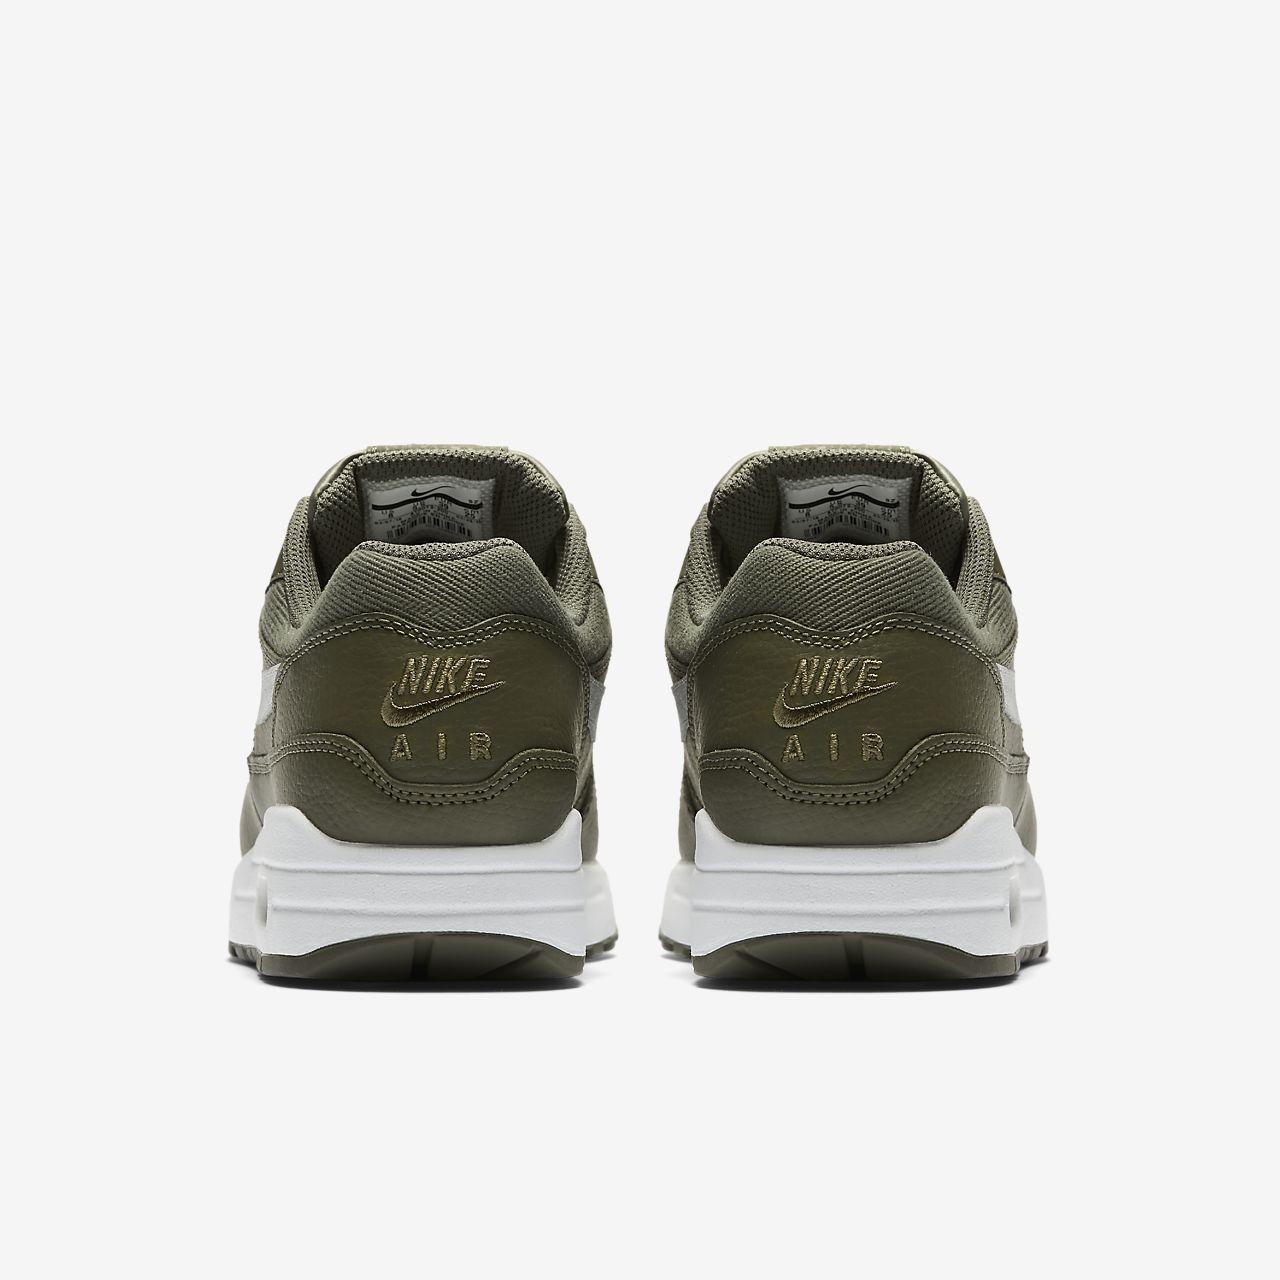 buy popular b37b4 ca6a4 ... Chaussure Nike Air Max 1 SE Glitter pour Femme